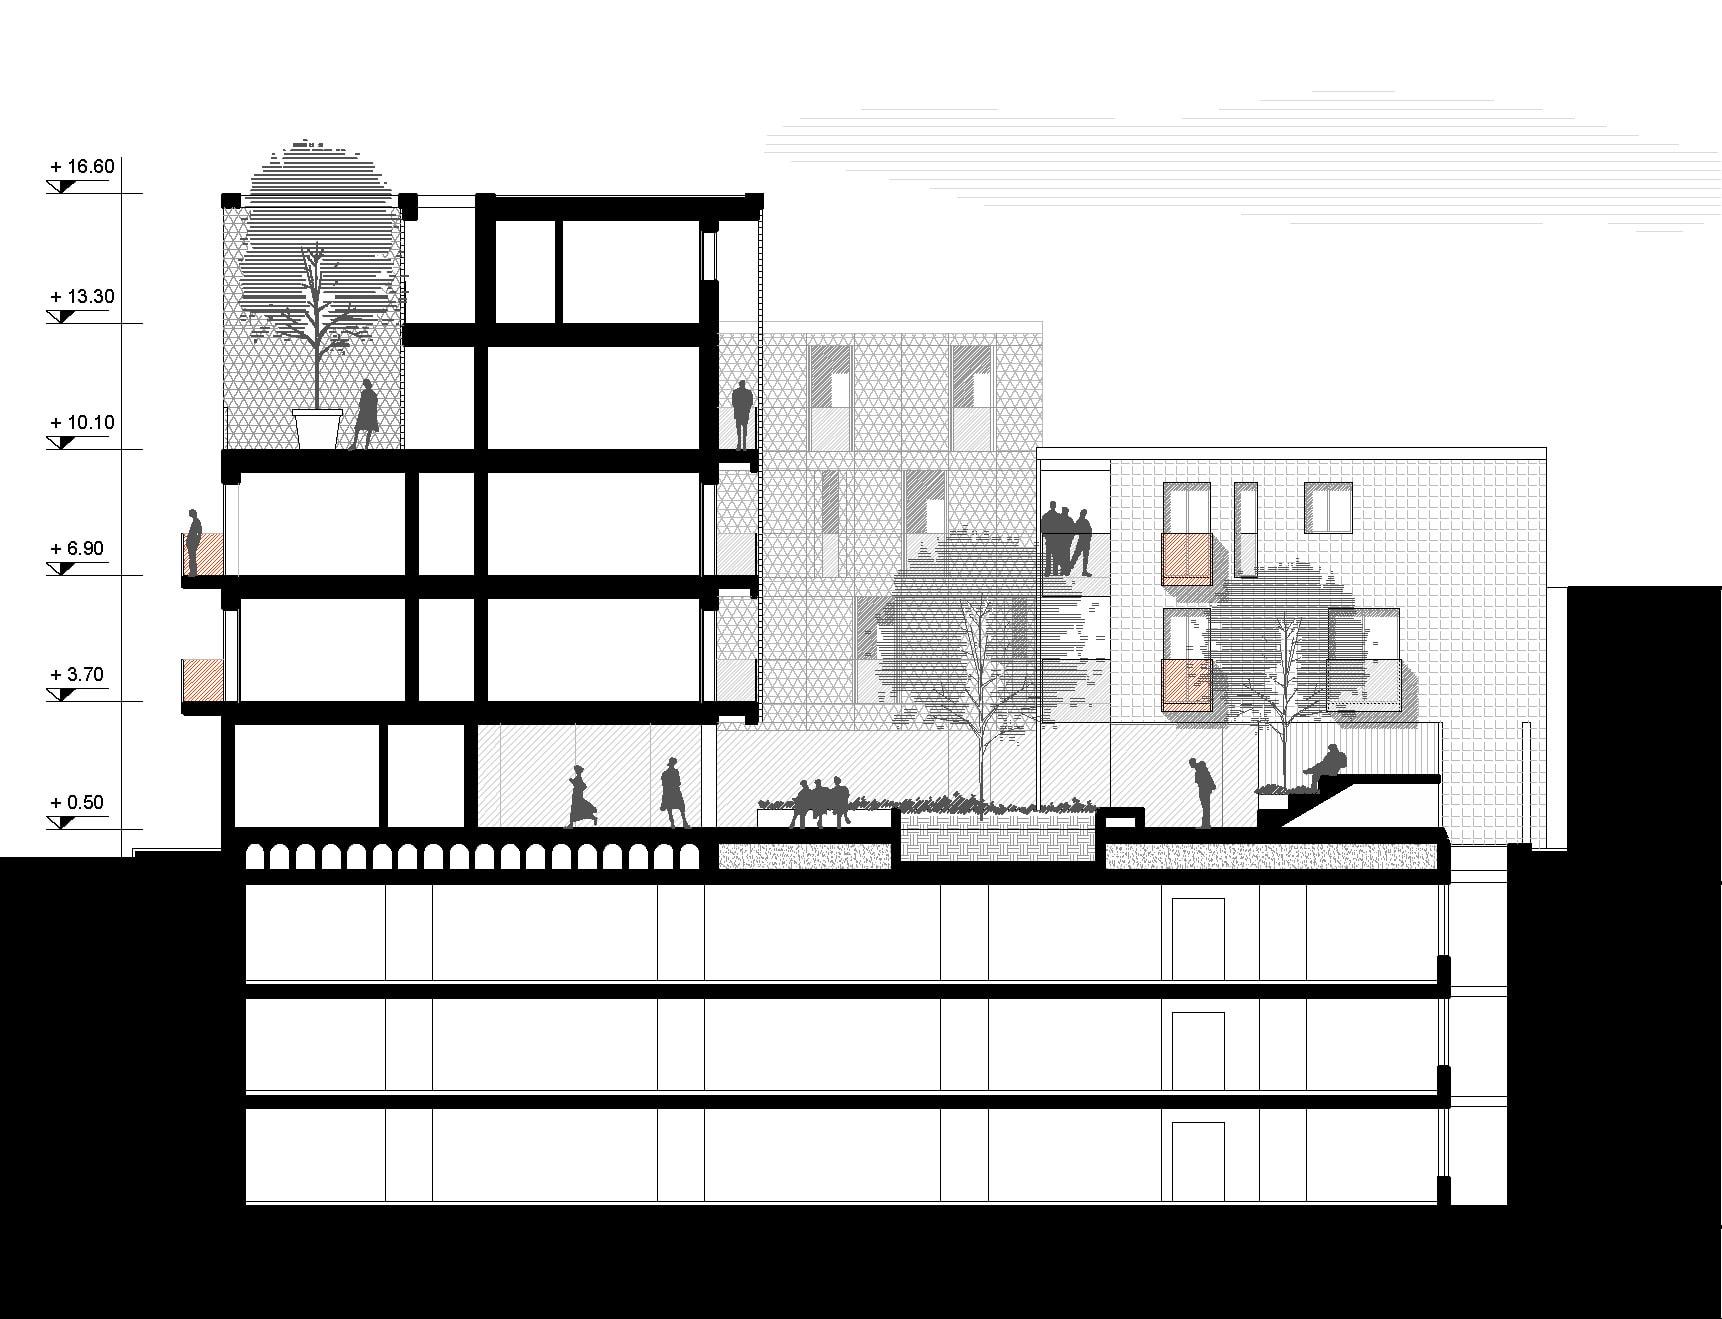 dapstudio / elena sacco - paolo danelli · STUDENT HOUSING ...